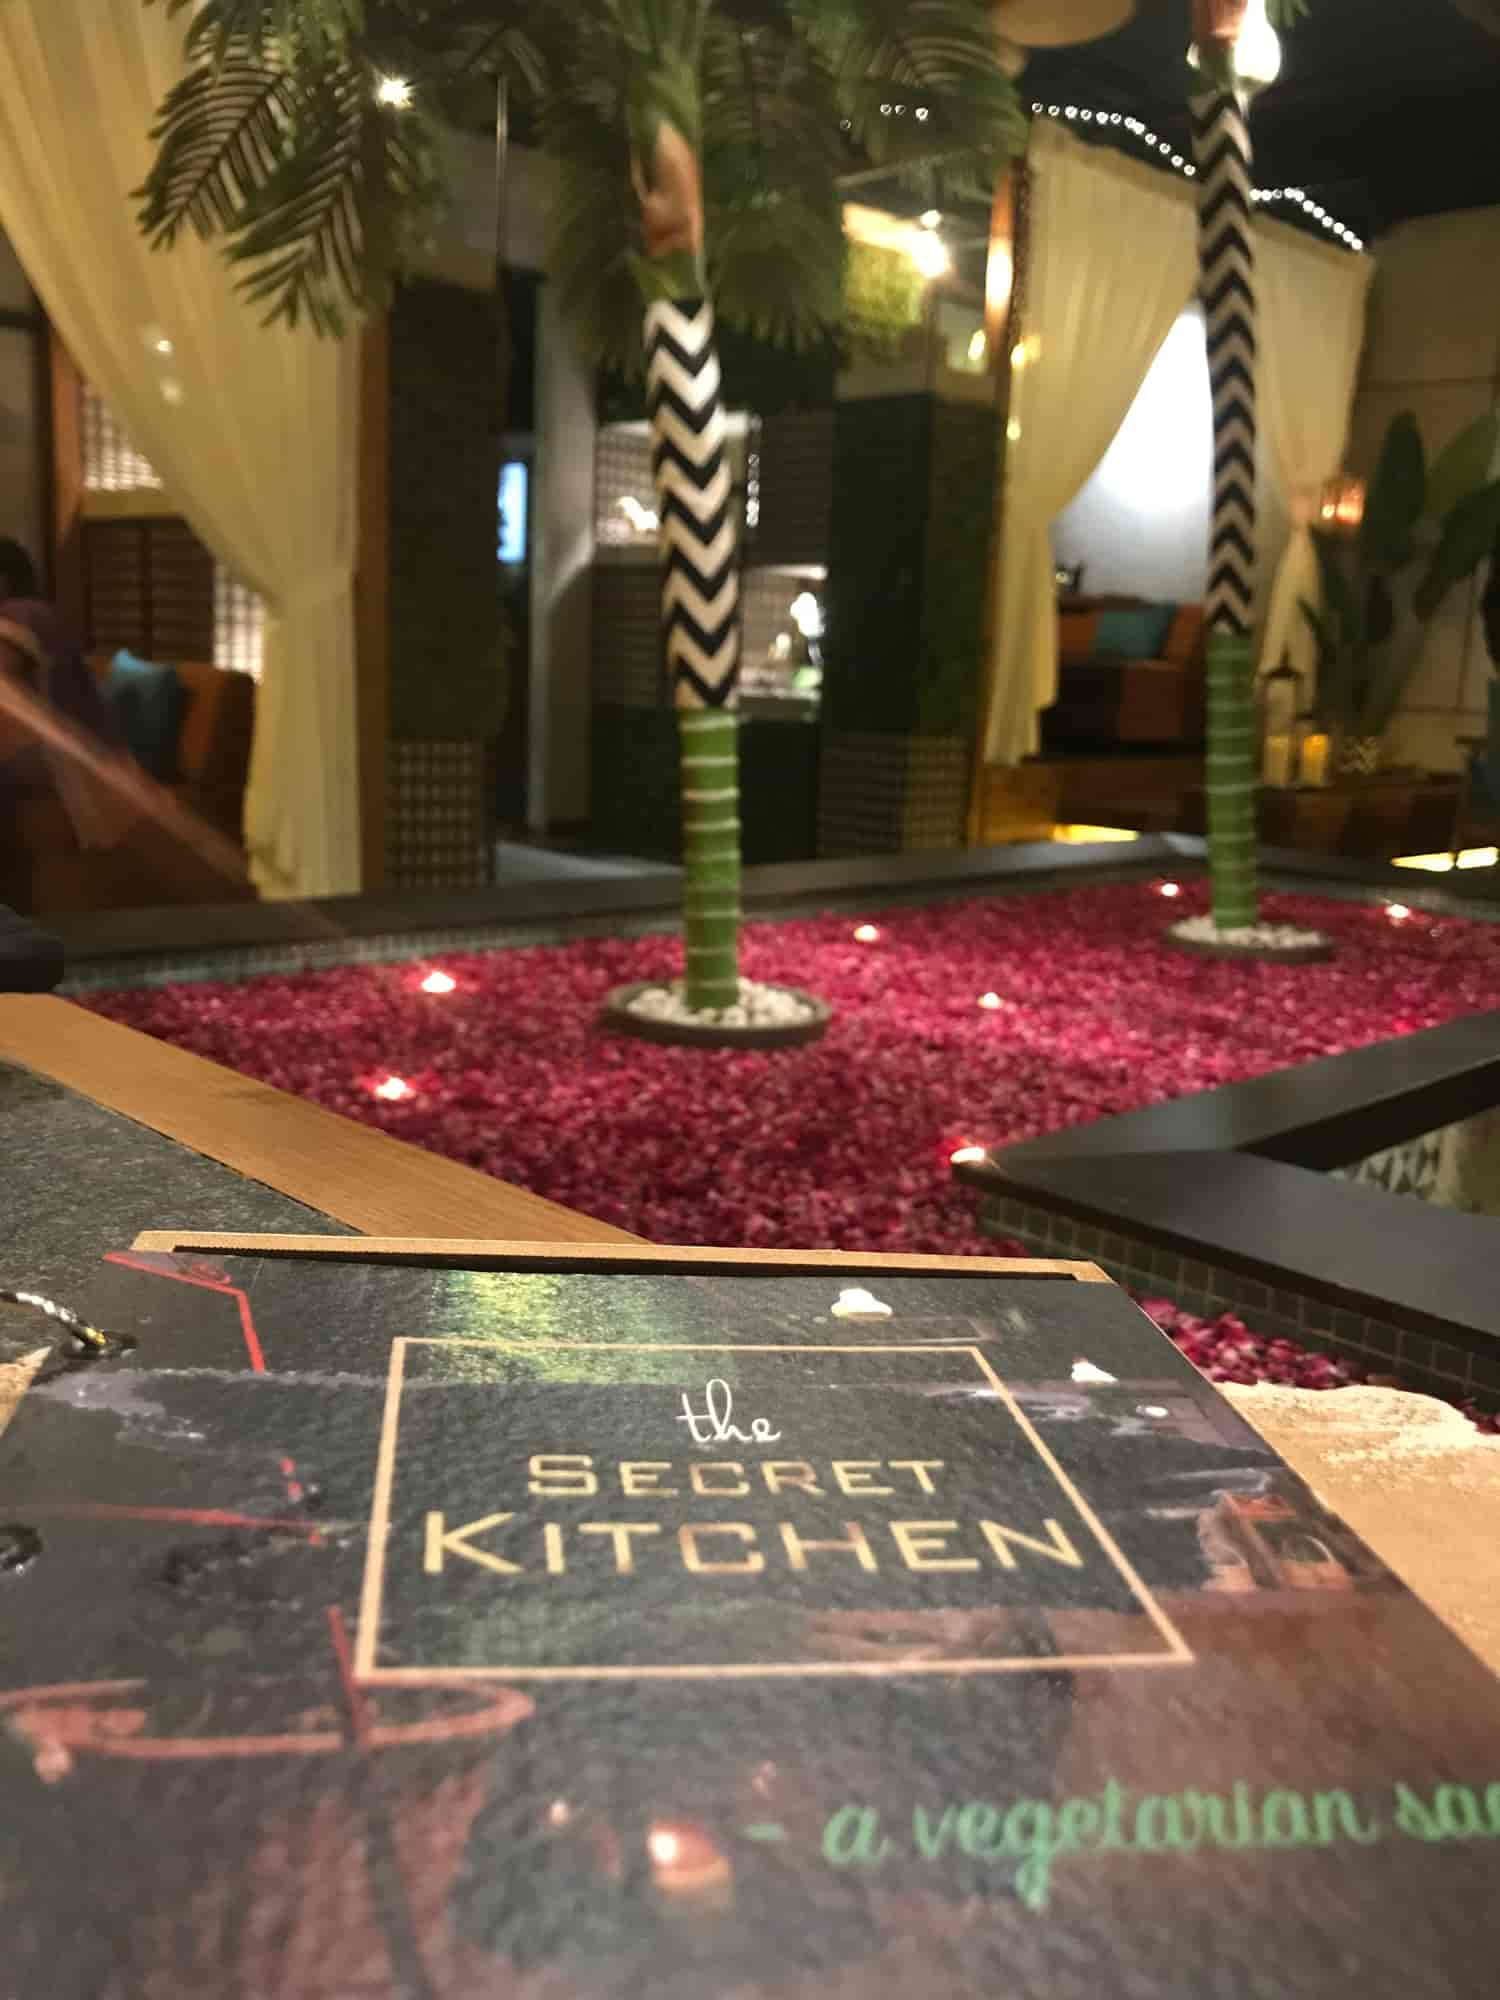 The Secret Kitchen Bodakdev Ahmedabad Pure Vegetarian North